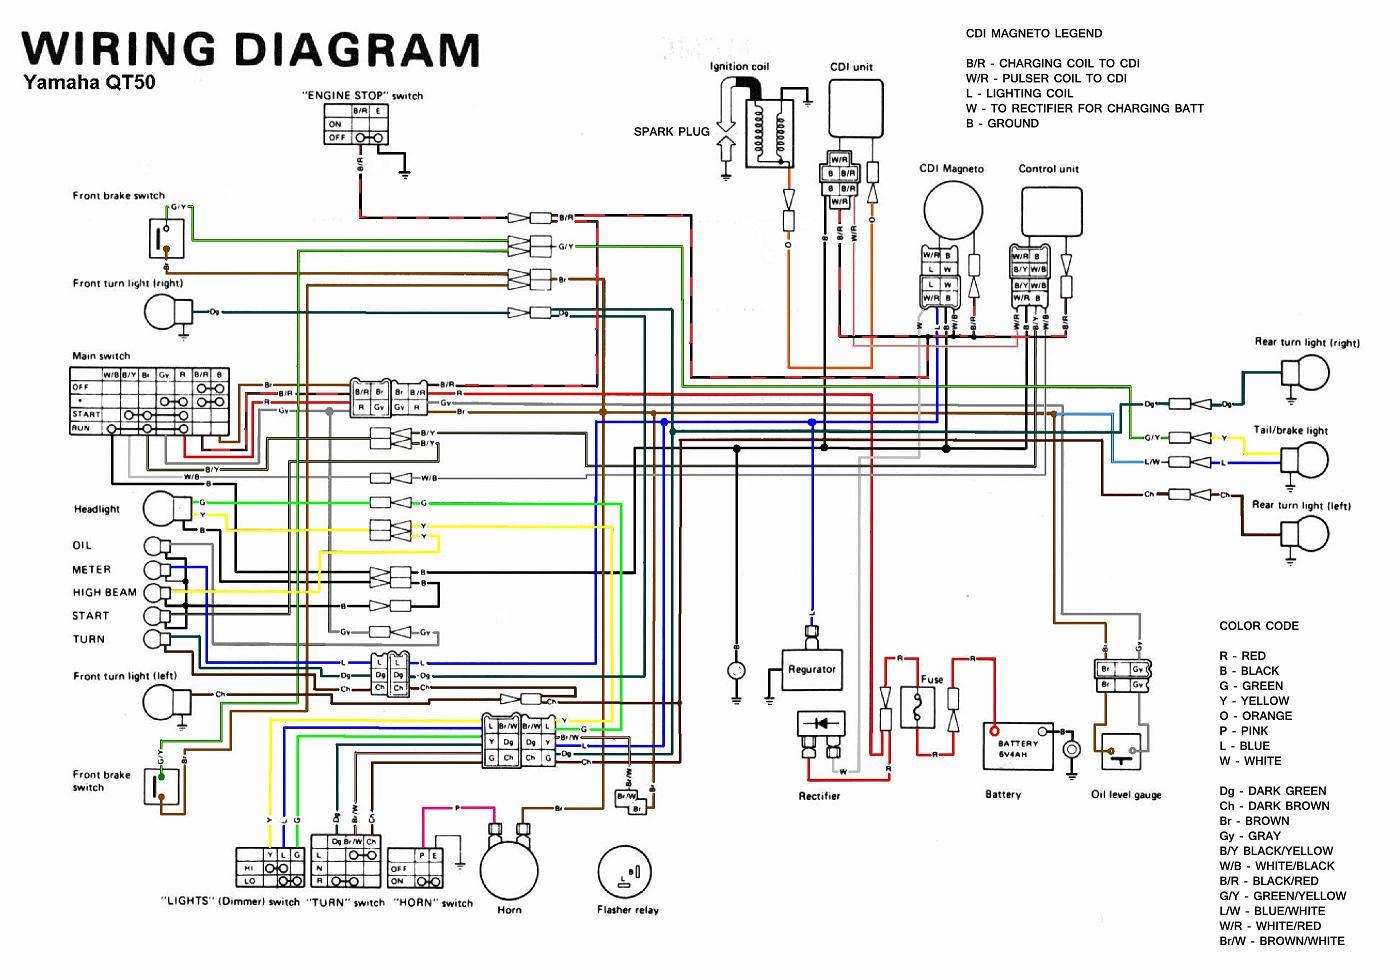 fancy xs1100 wiring diagram images electrical circuit diagram rh suaiphone org QT50 White QT50 Mods